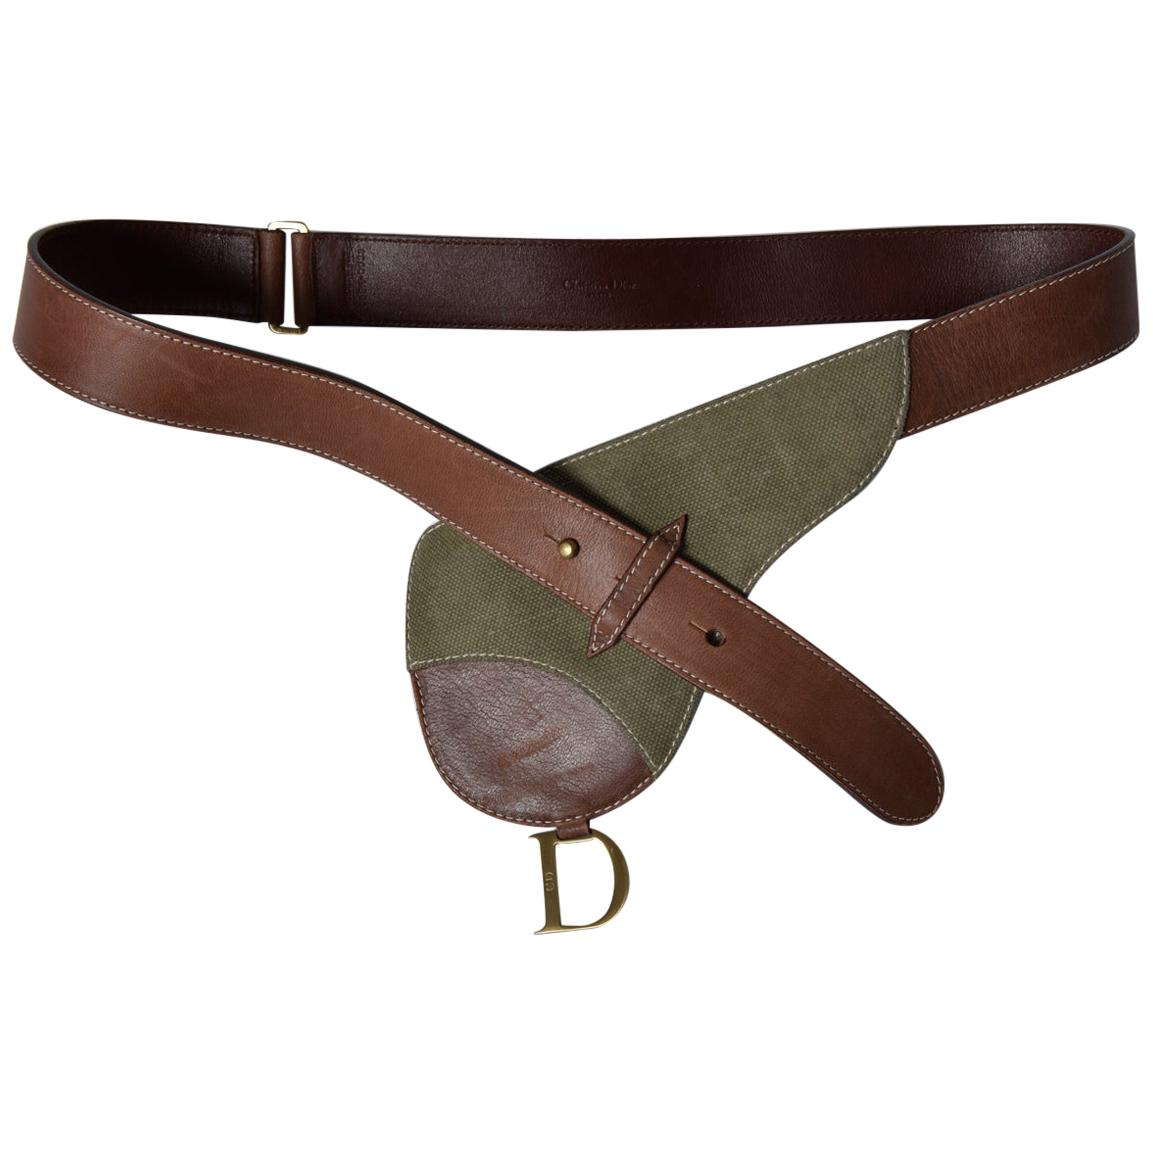 Christian Dior by John Galliano Saddle Belt Bag, Spring-Summer 2002